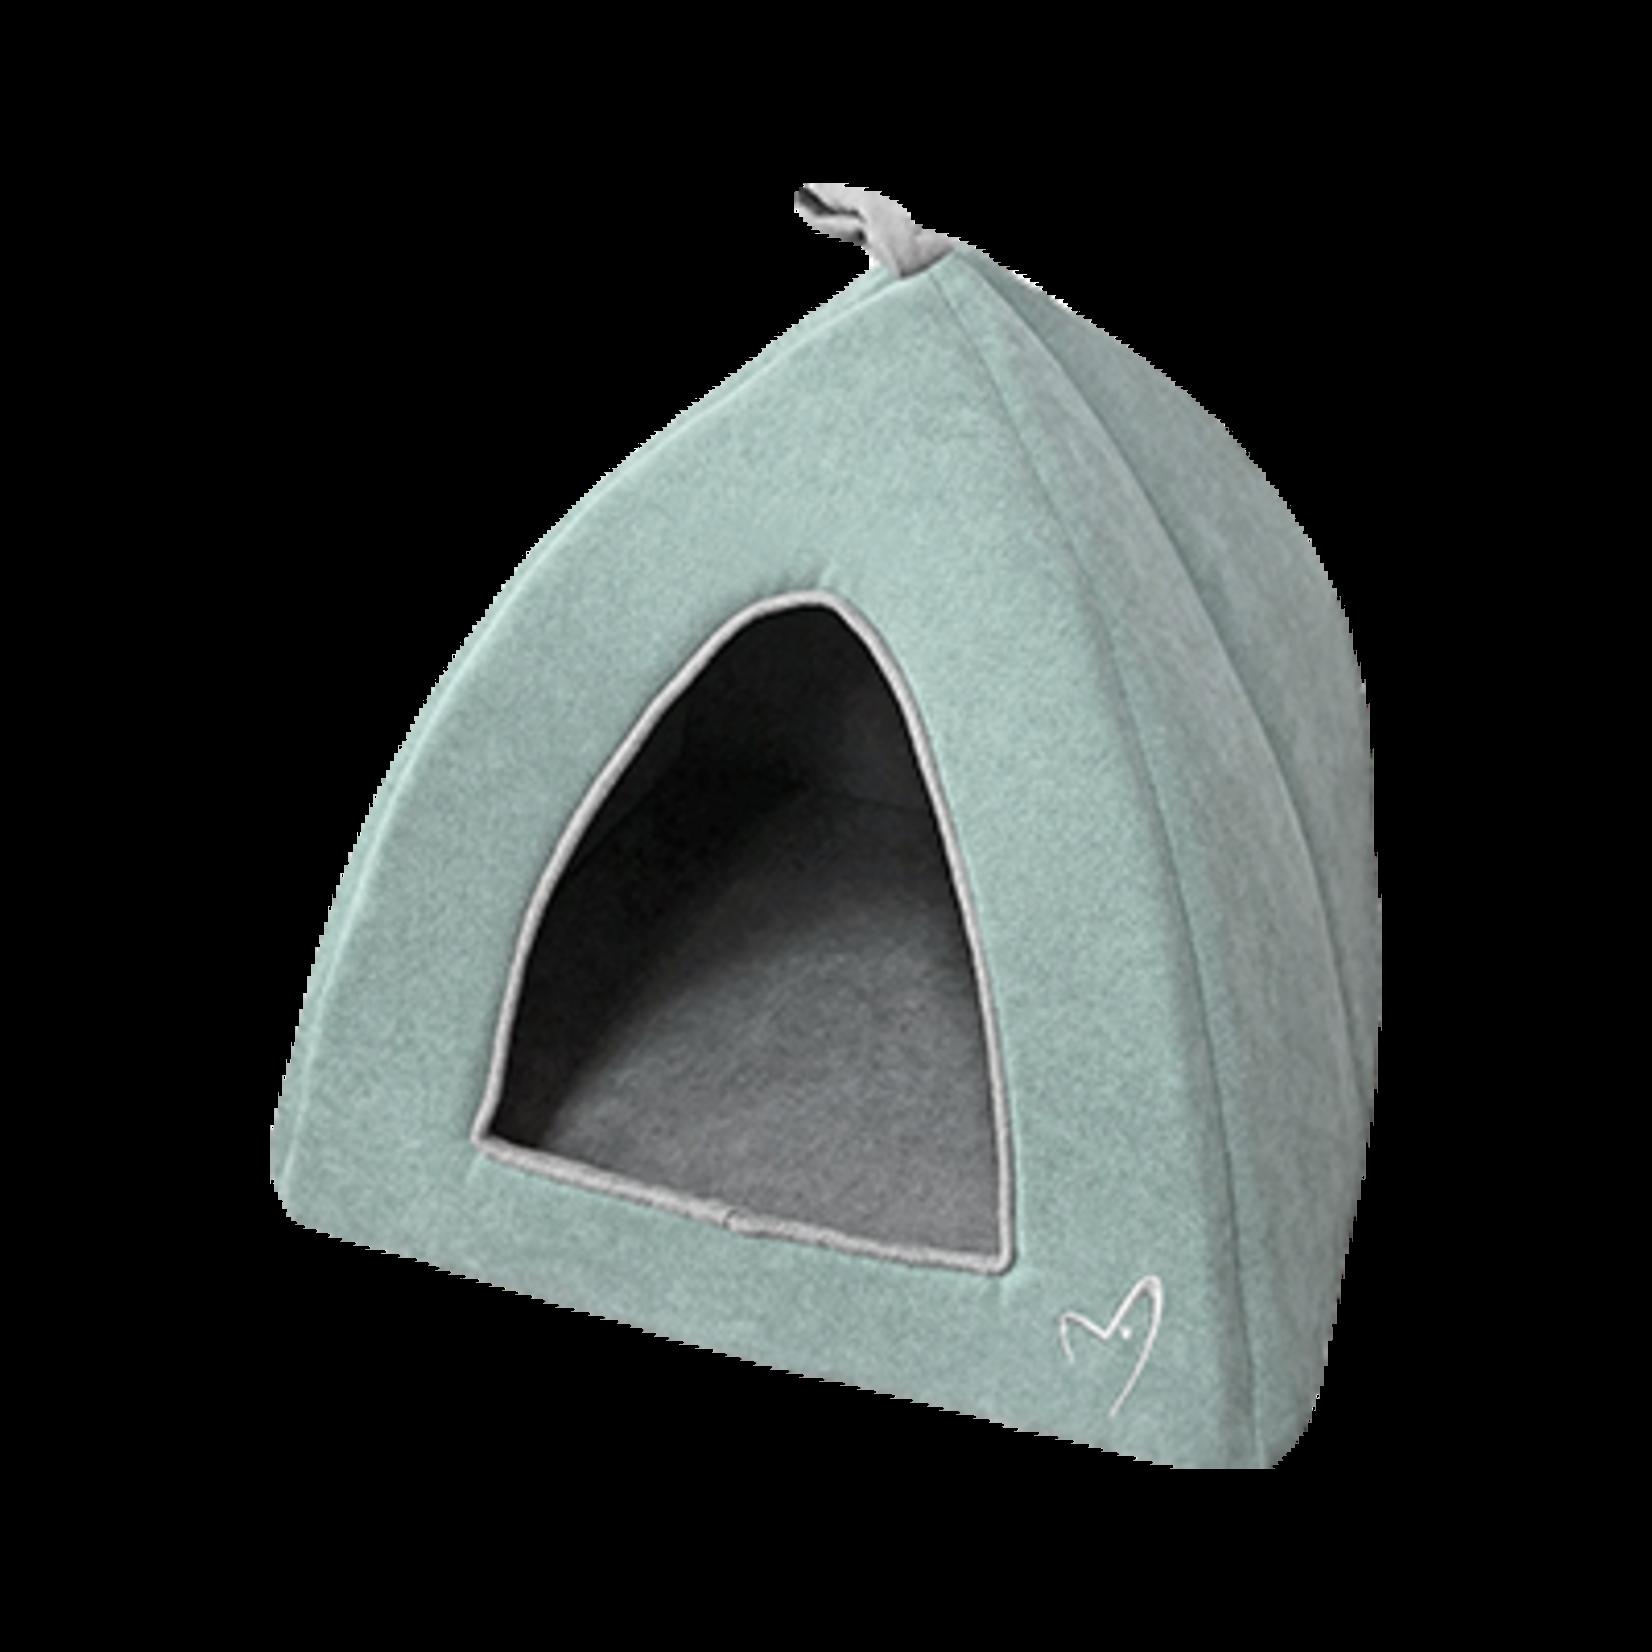 Gor Pets Camden Pyramid Cat Bed 40x40x40cm in Mint***